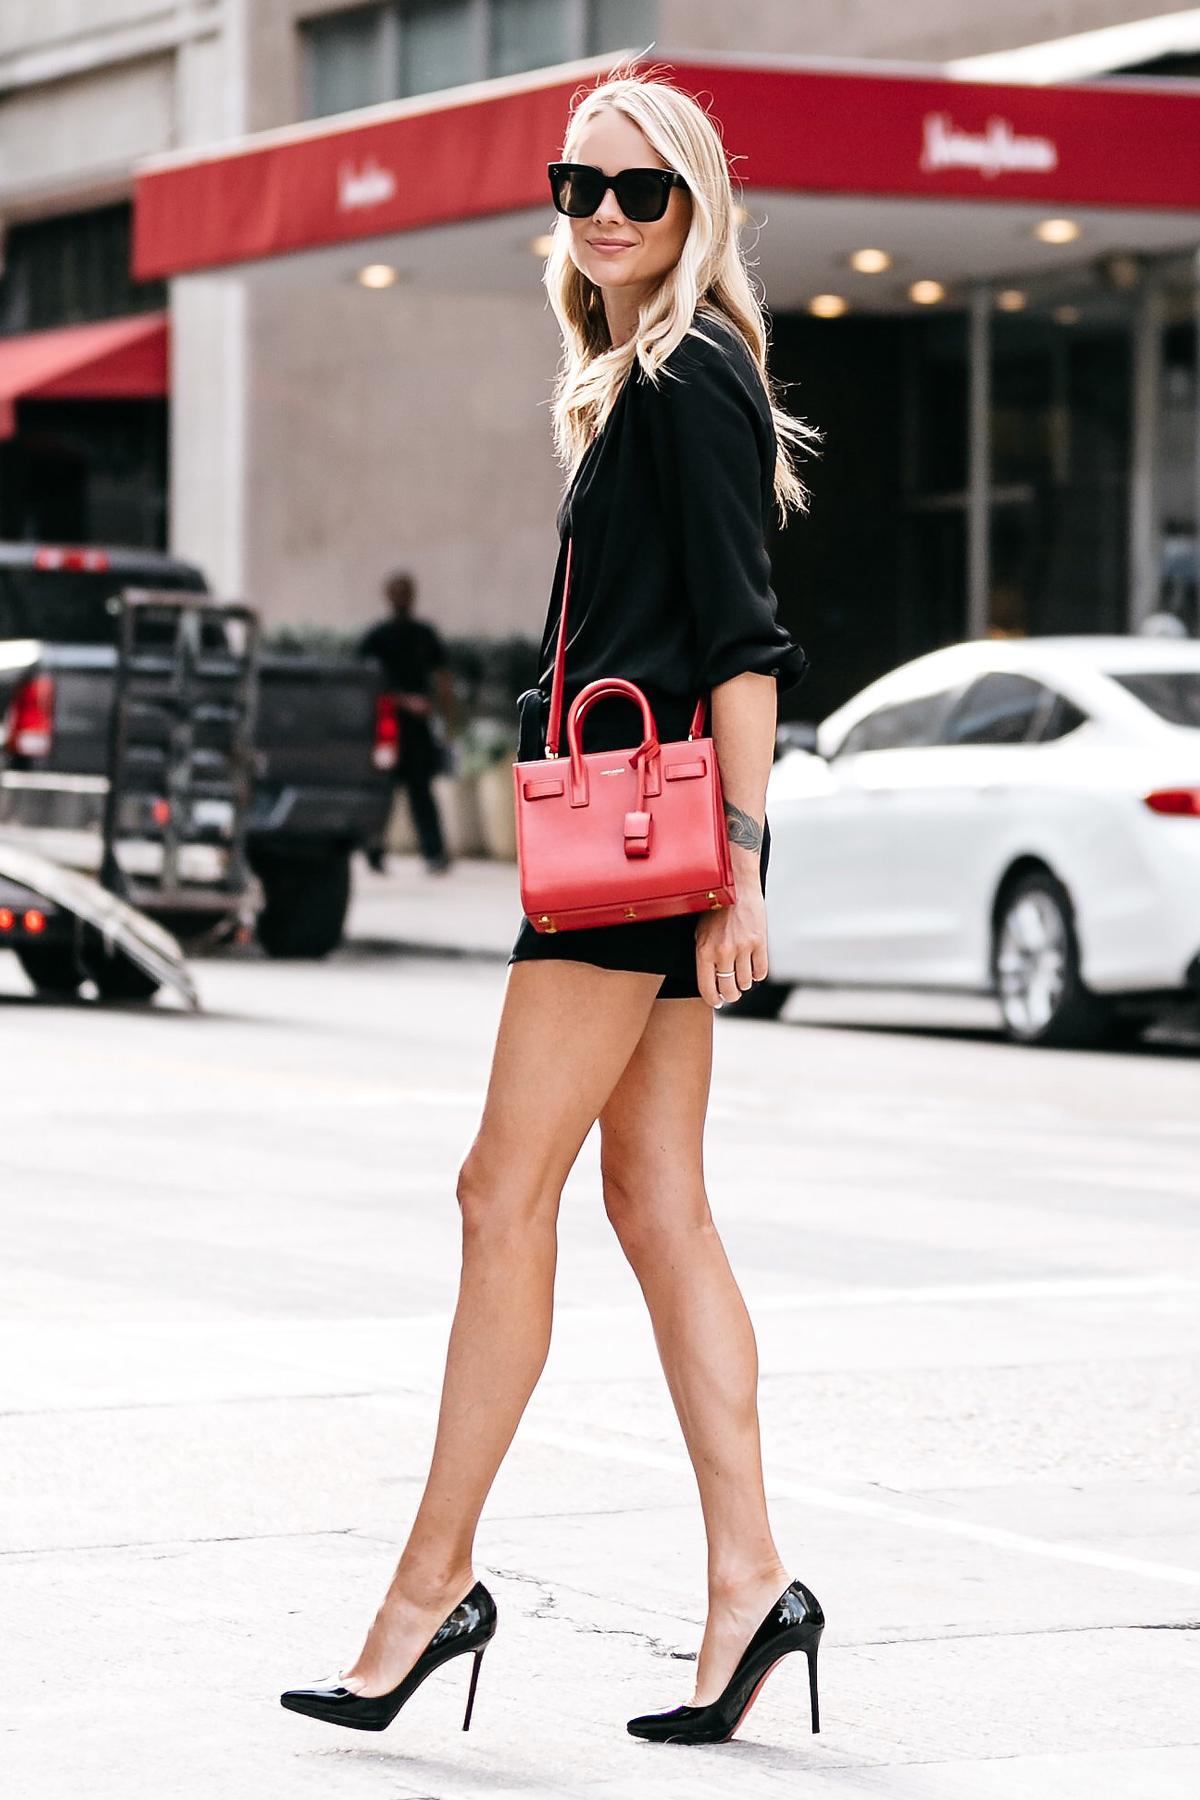 Blonde Woman Wearing Nordstrom Black Blouse Nordstrom Black Tie Front Shorts YSL Sac De Jour Nano Red Christian Louboutin Black Pumps Street Style Outfit Dallas Blogger Fashion Blogger